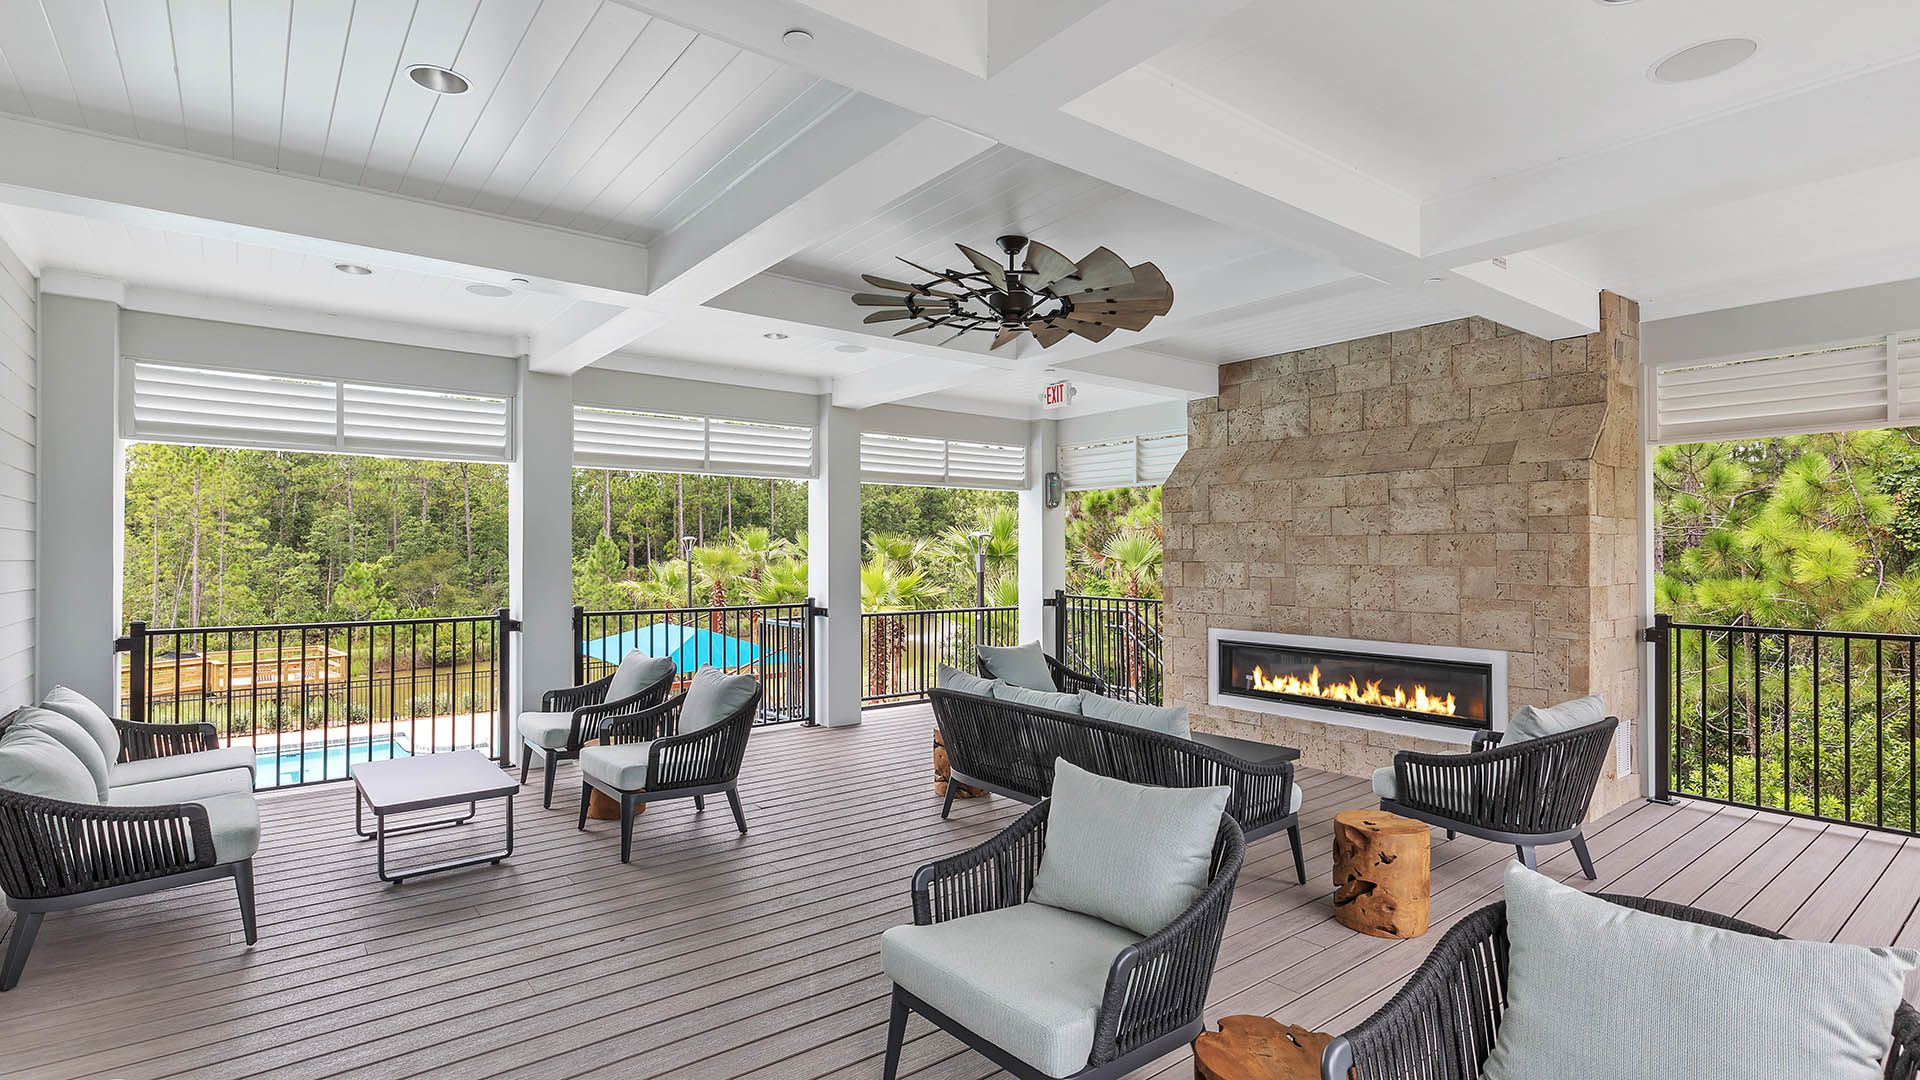 Living Area featured in the SIESTA KEY By D.R. Horton in Daytona Beach, FL